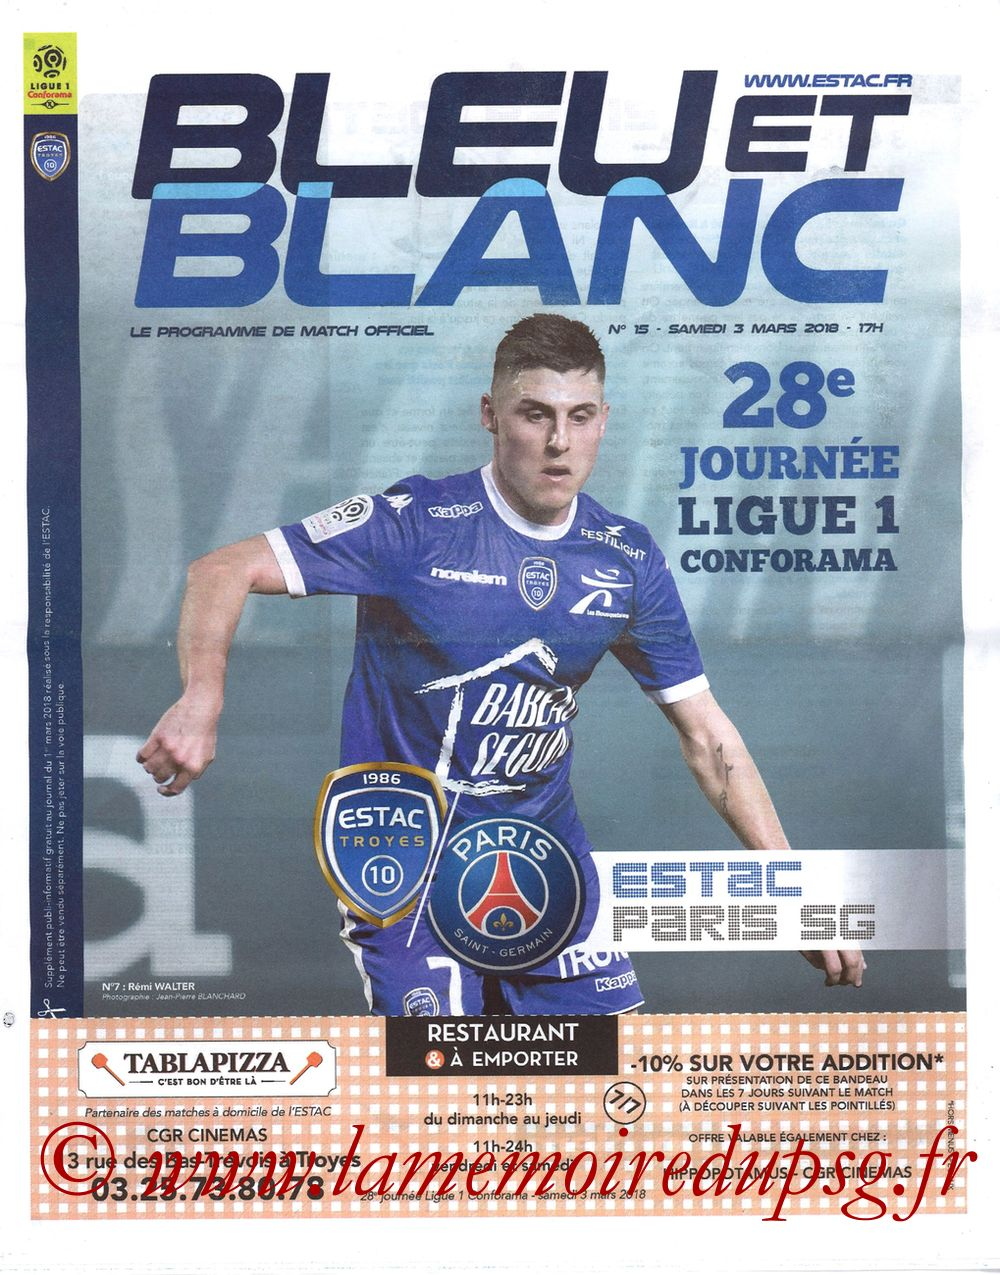 2018-03-03  Troyes-PSG (28ème L1, Bleu et Blanc N°15)